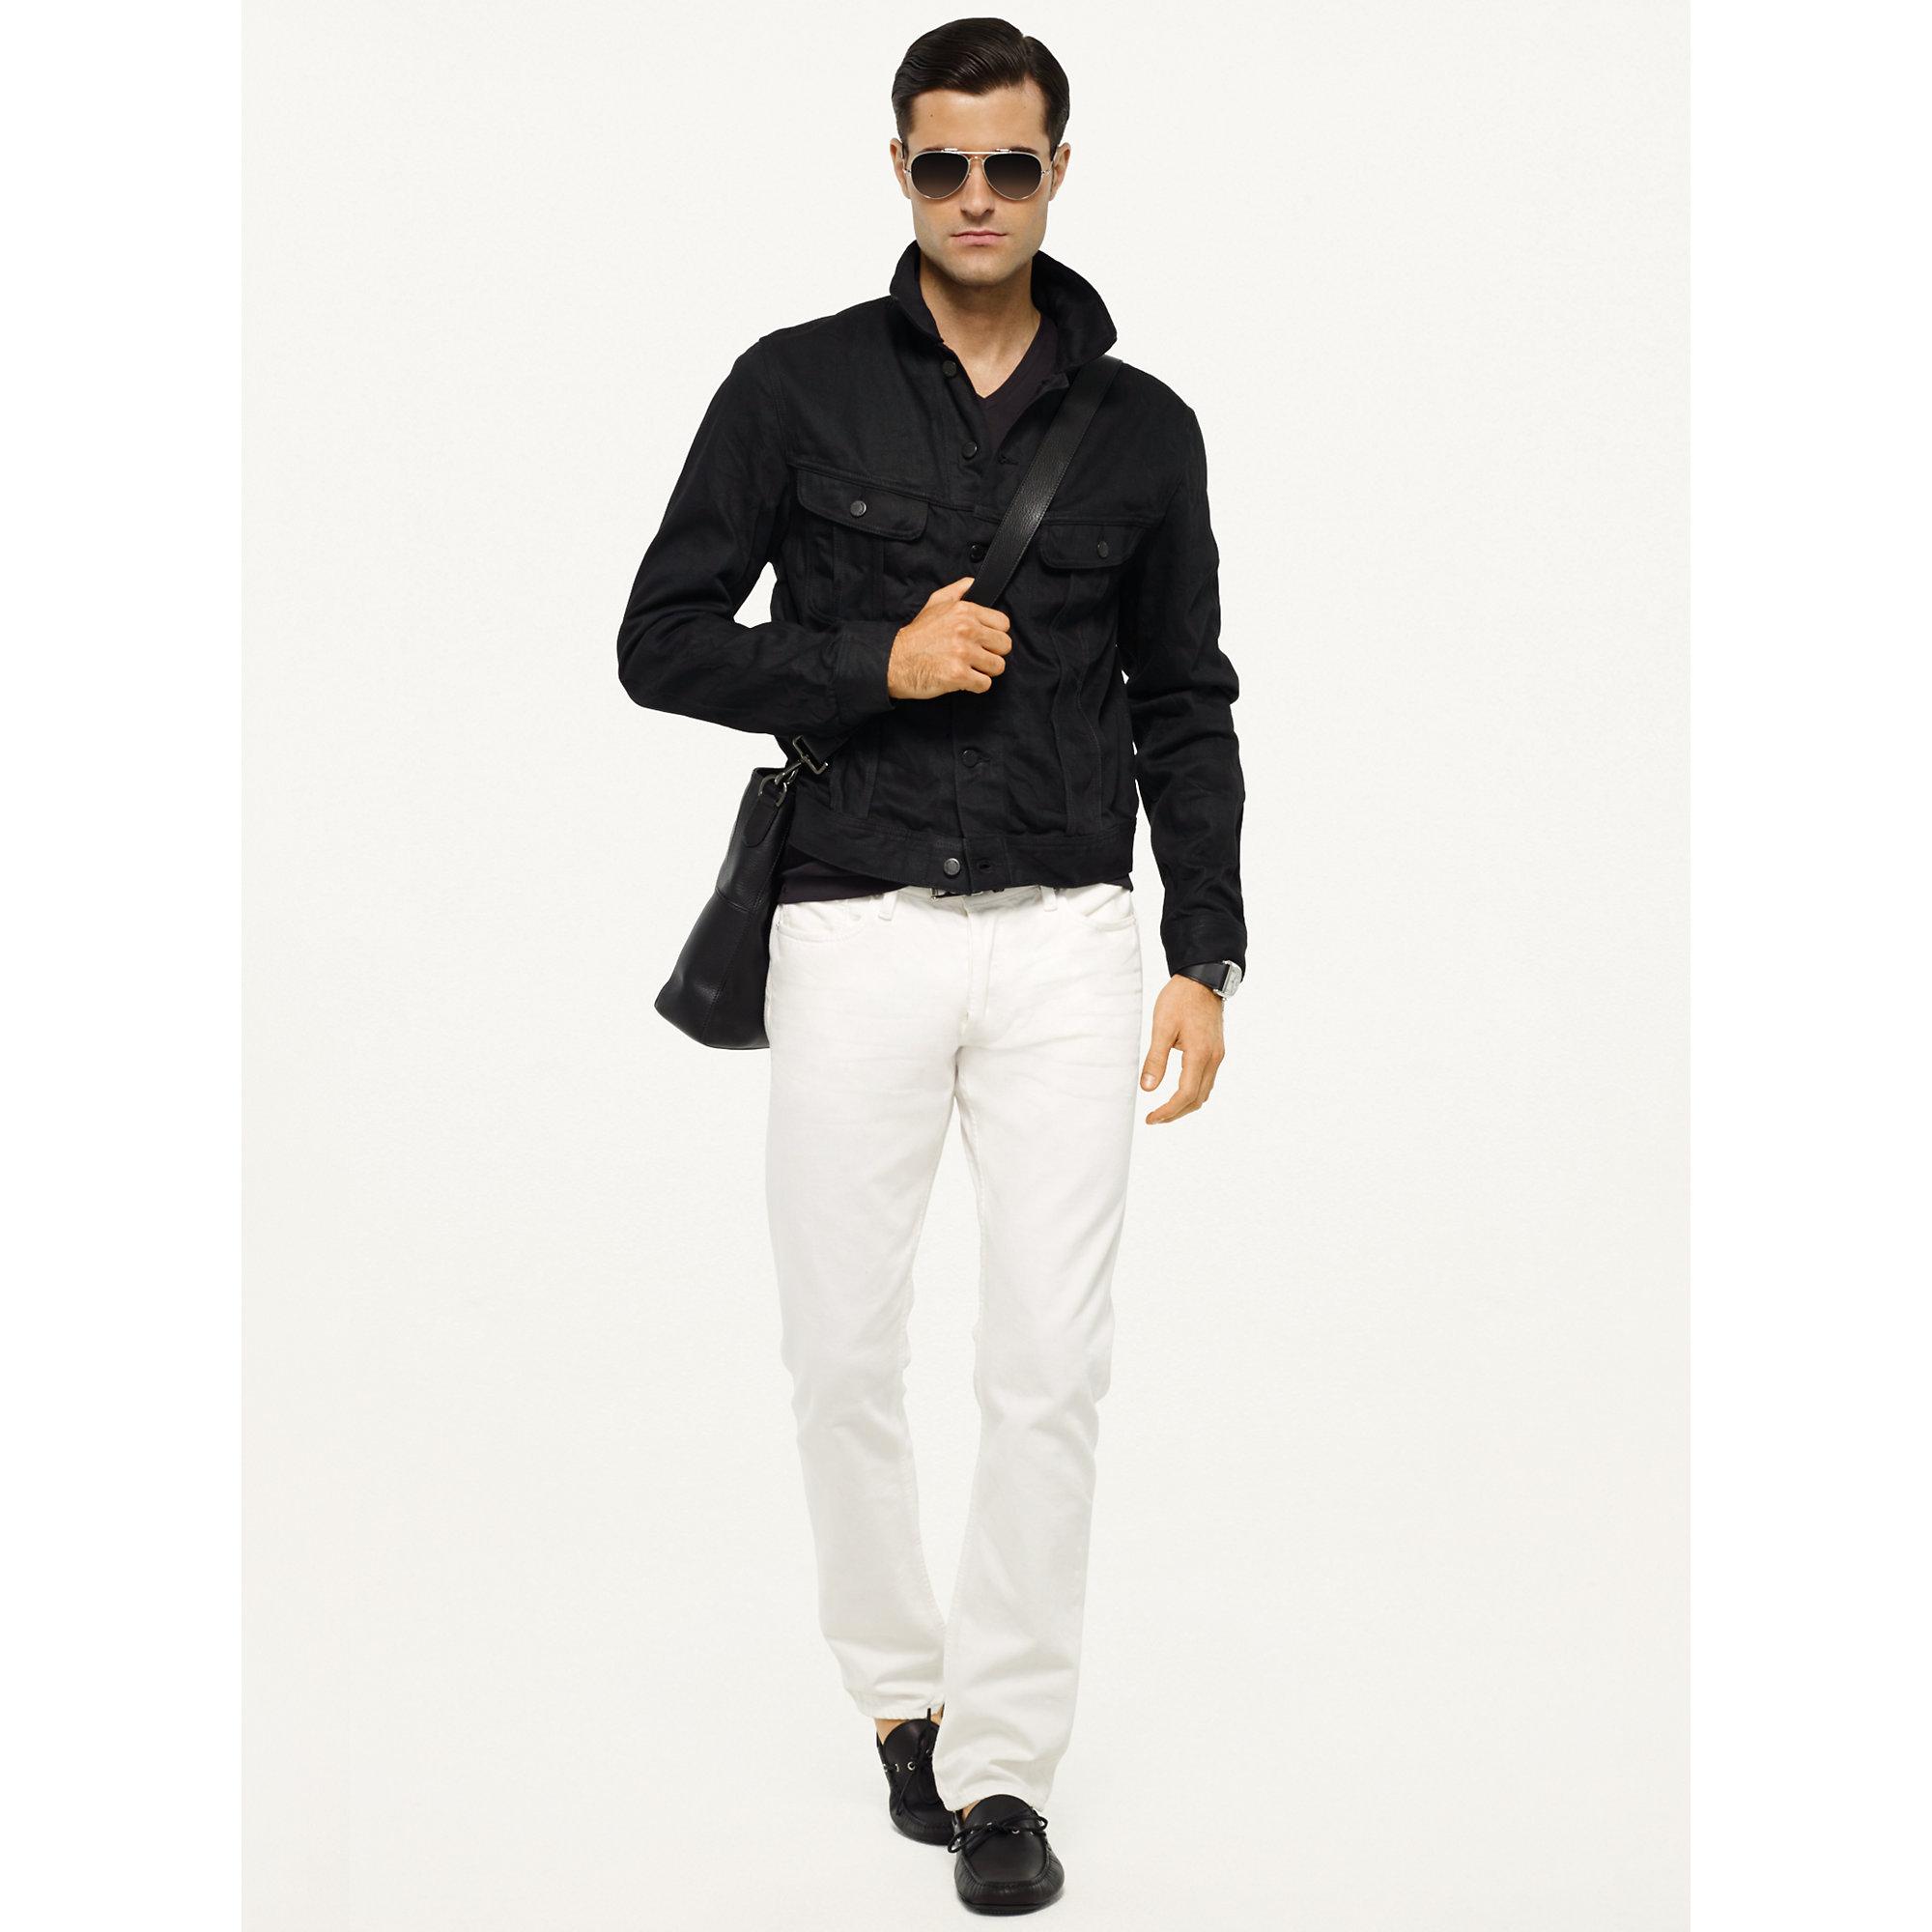 edfb4c7cc3 Lyst - Ralph Lauren Black Label Mason Trucker Jacket in Black for Men